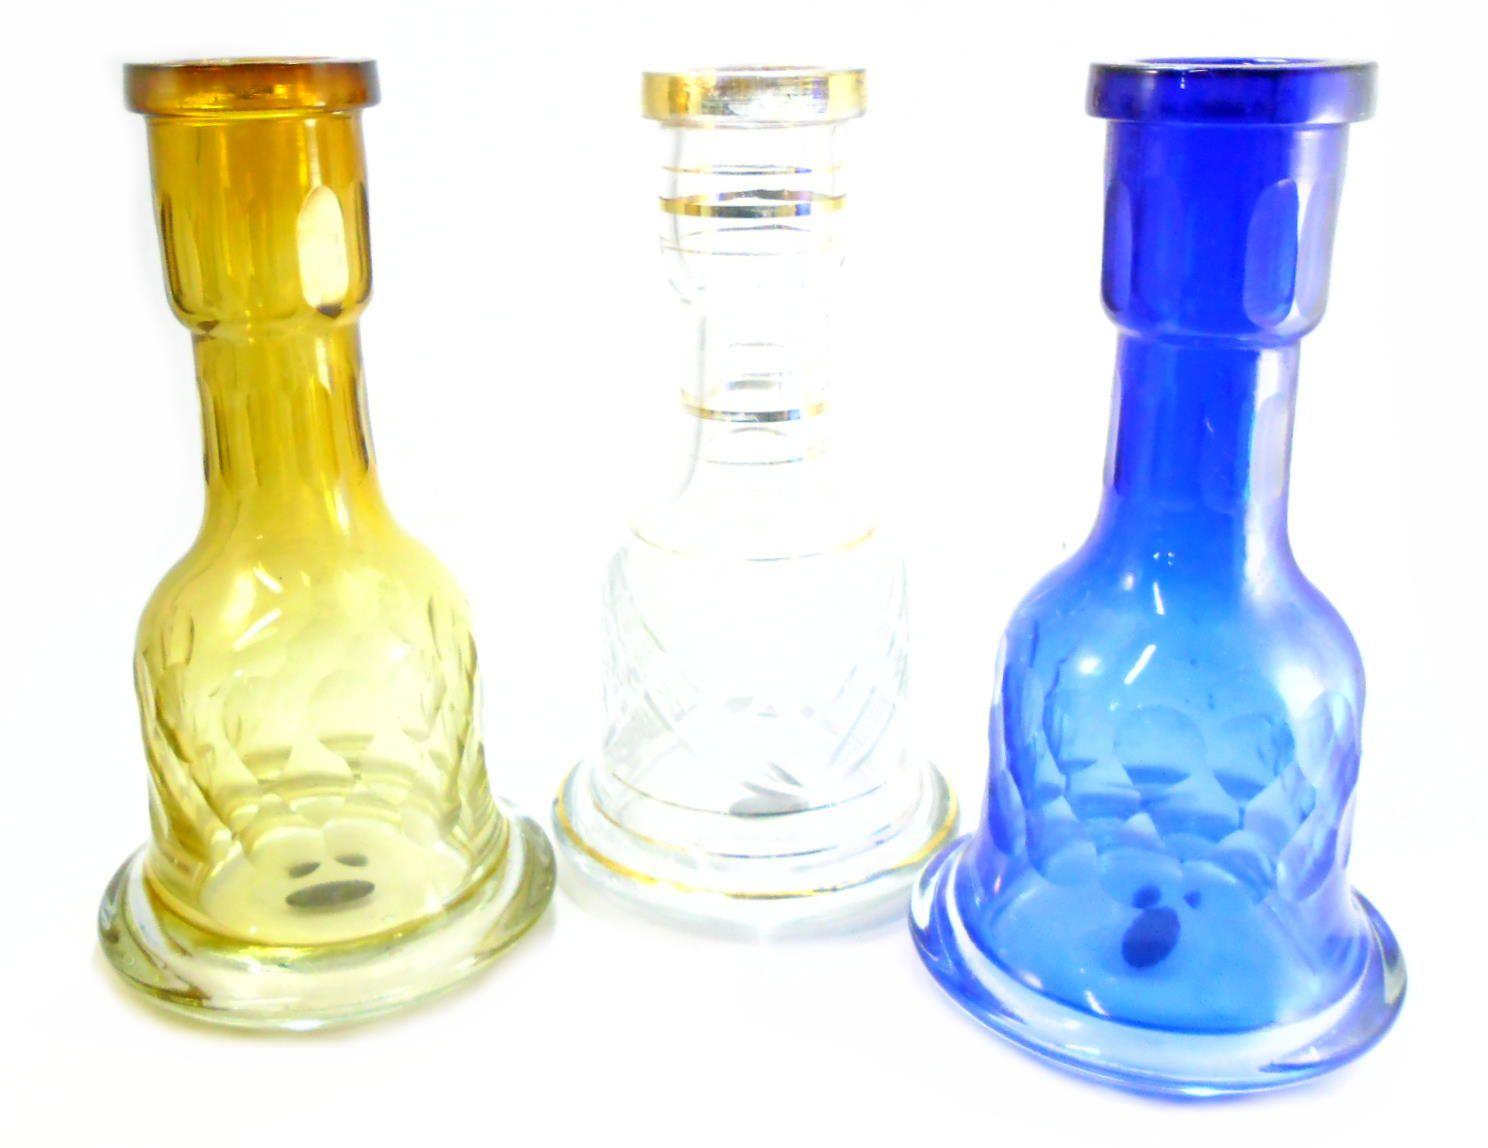 Vaso/base para narguile em cristal, LASER CUT, lapidado a laser, PARA NARGUILES GRANDES. 28 cm alt.